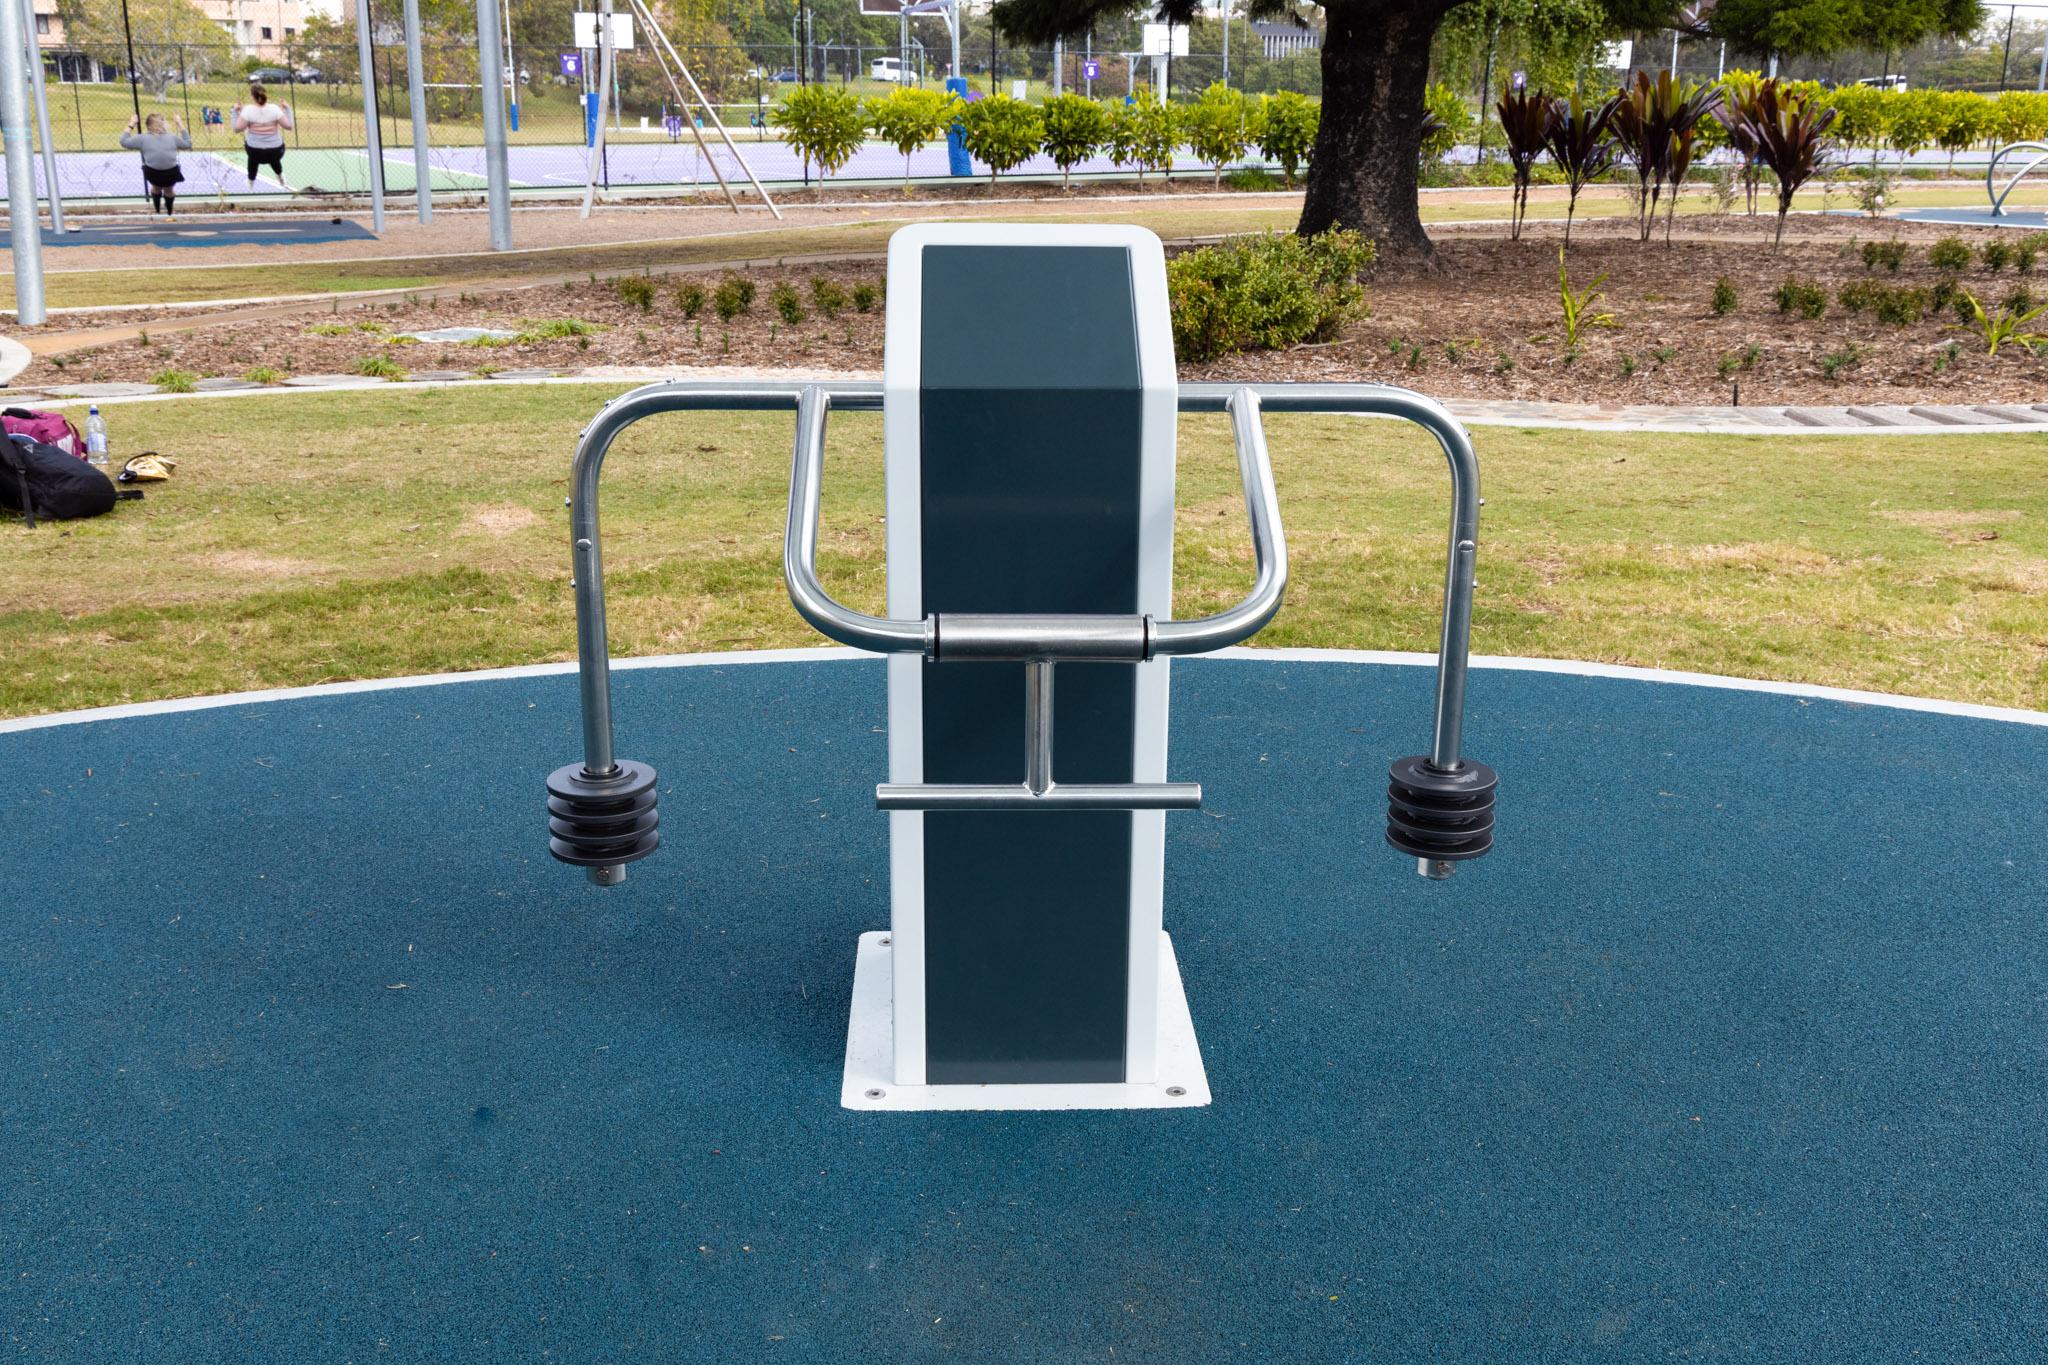 uq-outdoor-fitness-austek-play-brisbane-01